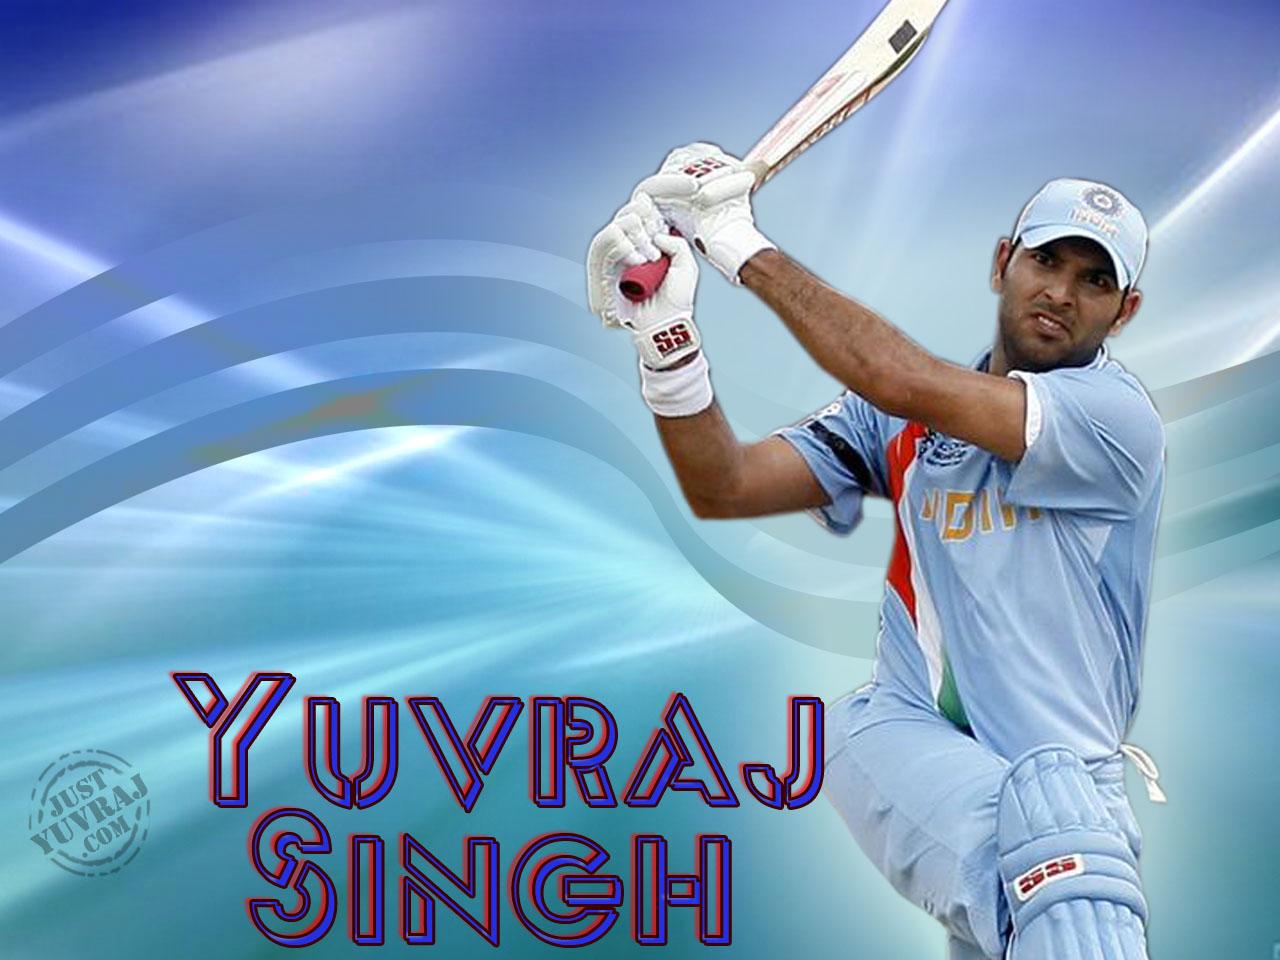 http://1.bp.blogspot.com/-qeyto4wsvcE/UOUqSk6q5gI/AAAAAAAAKr0/oEqiipiMfFo/s1600/cricketers+wallpapers-4.jpg